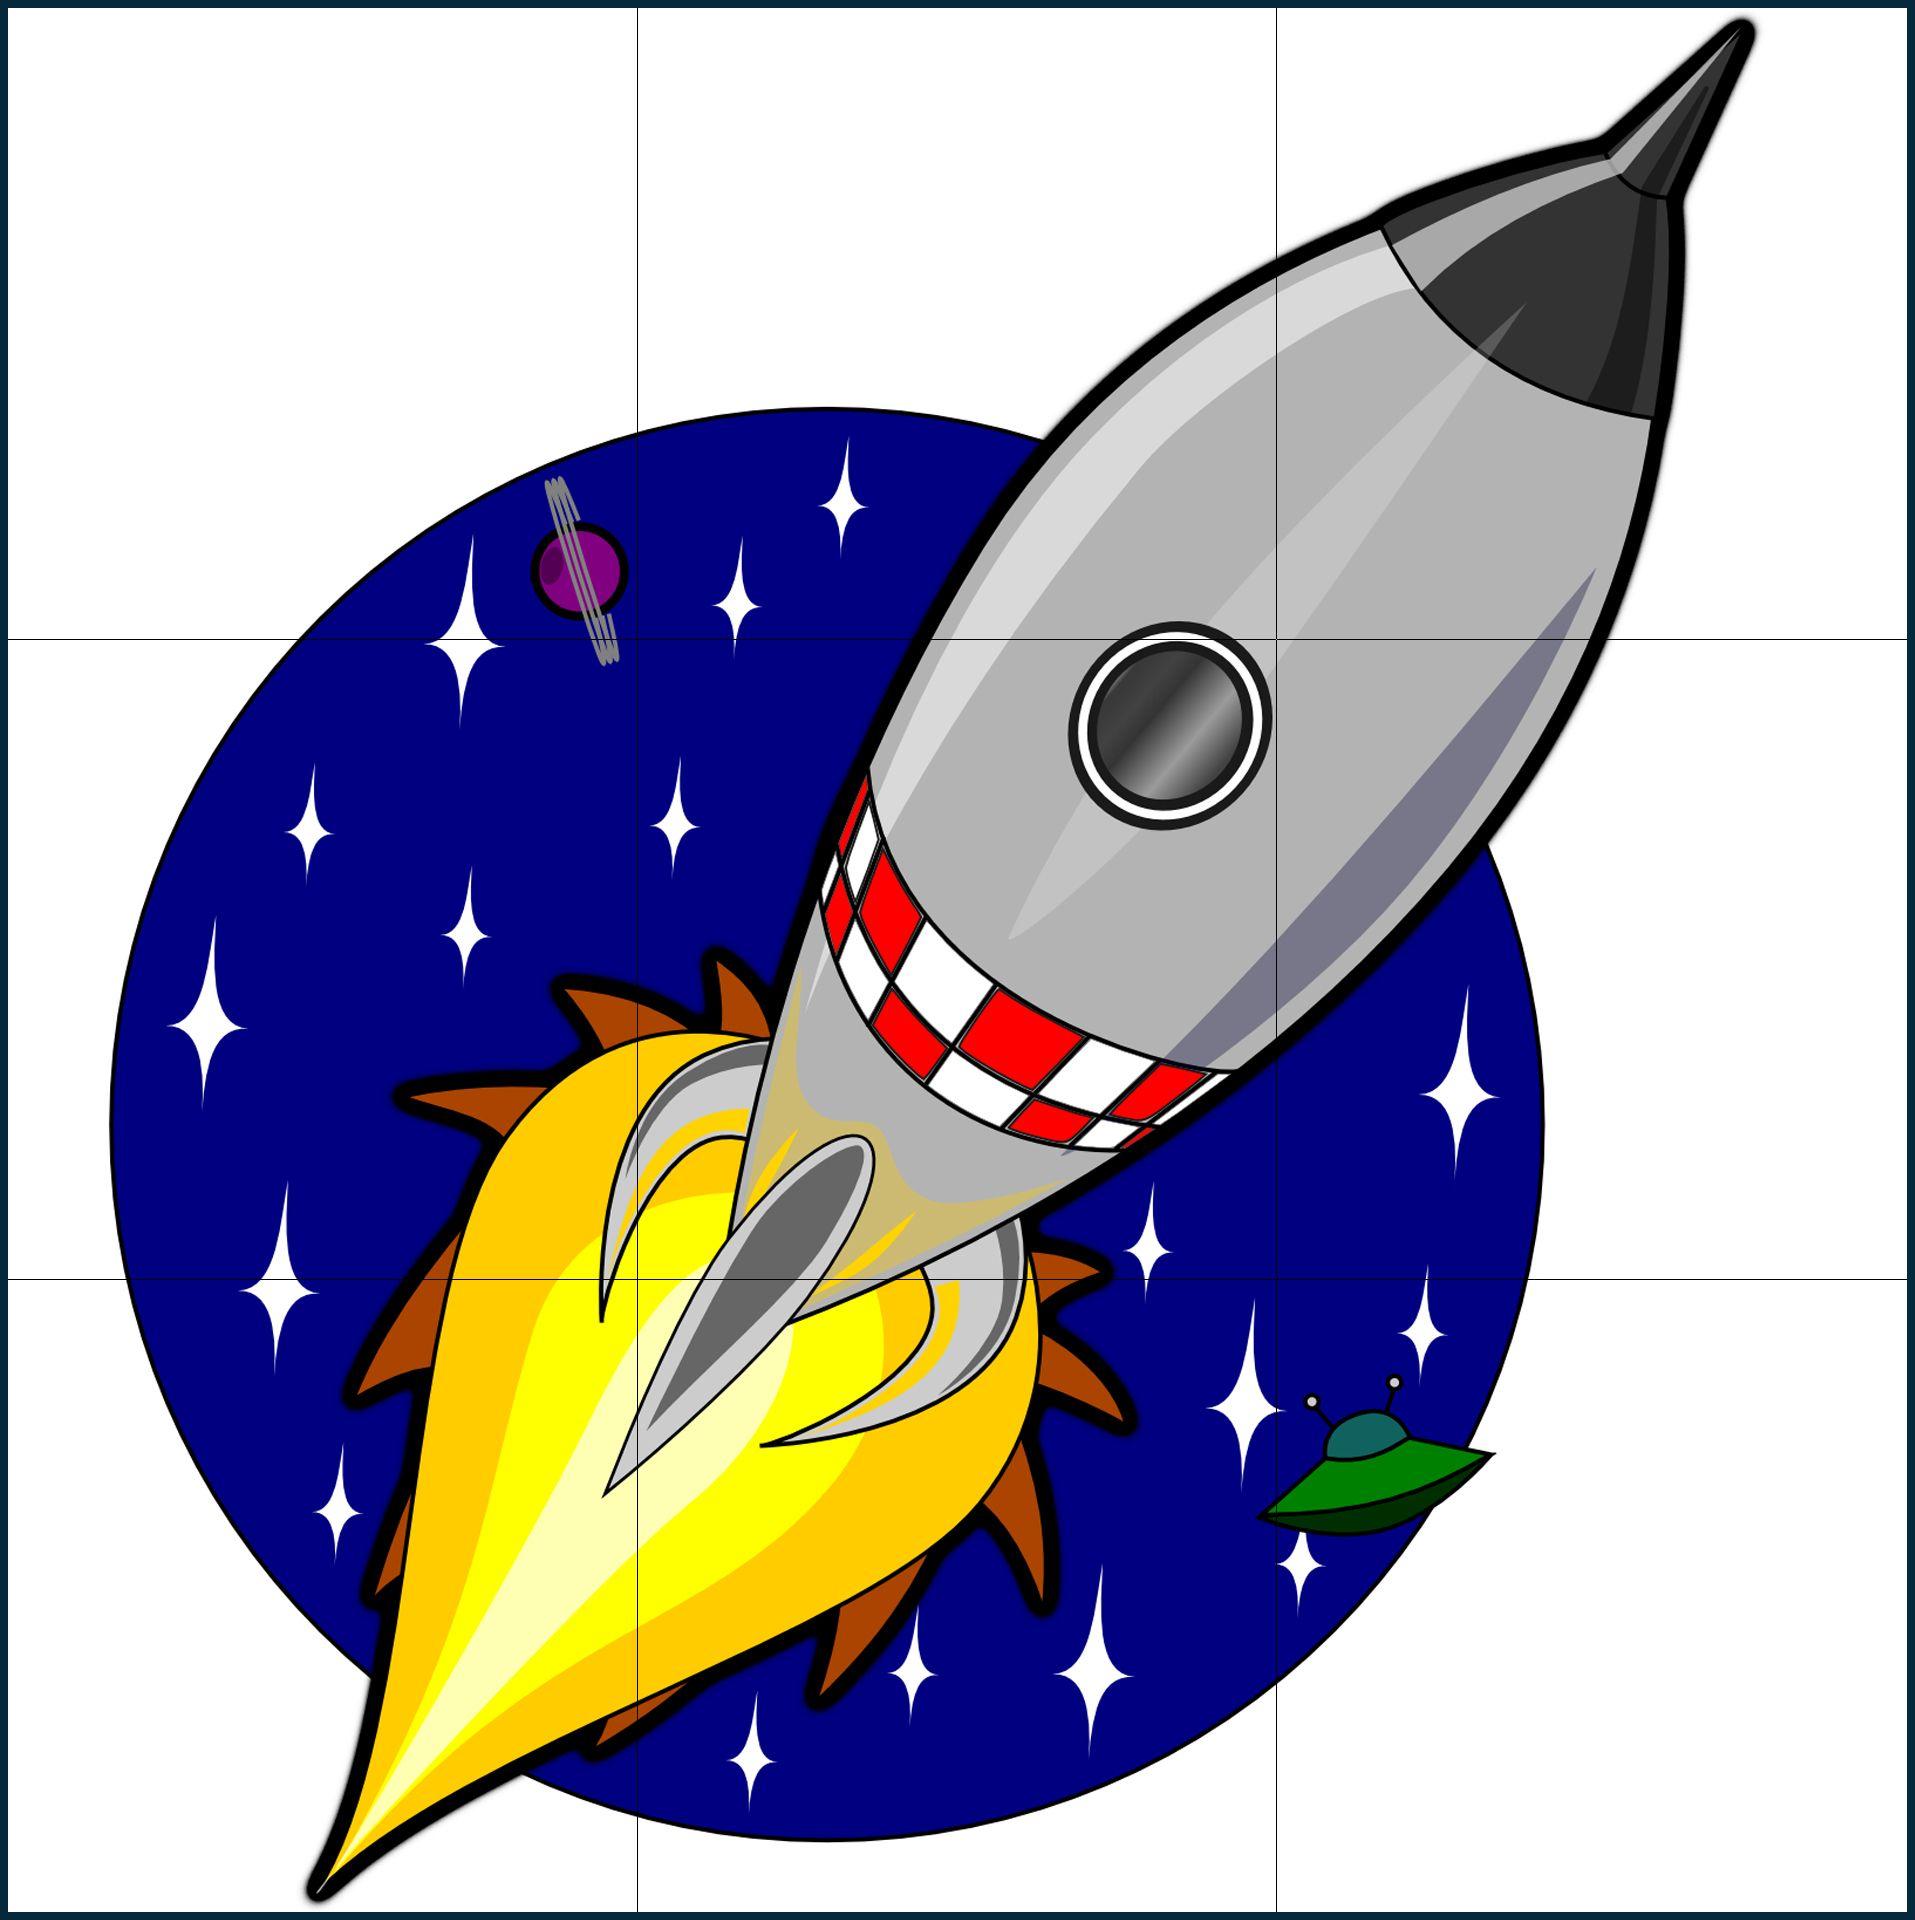 День космонавтики картинка на прозрачном фоне